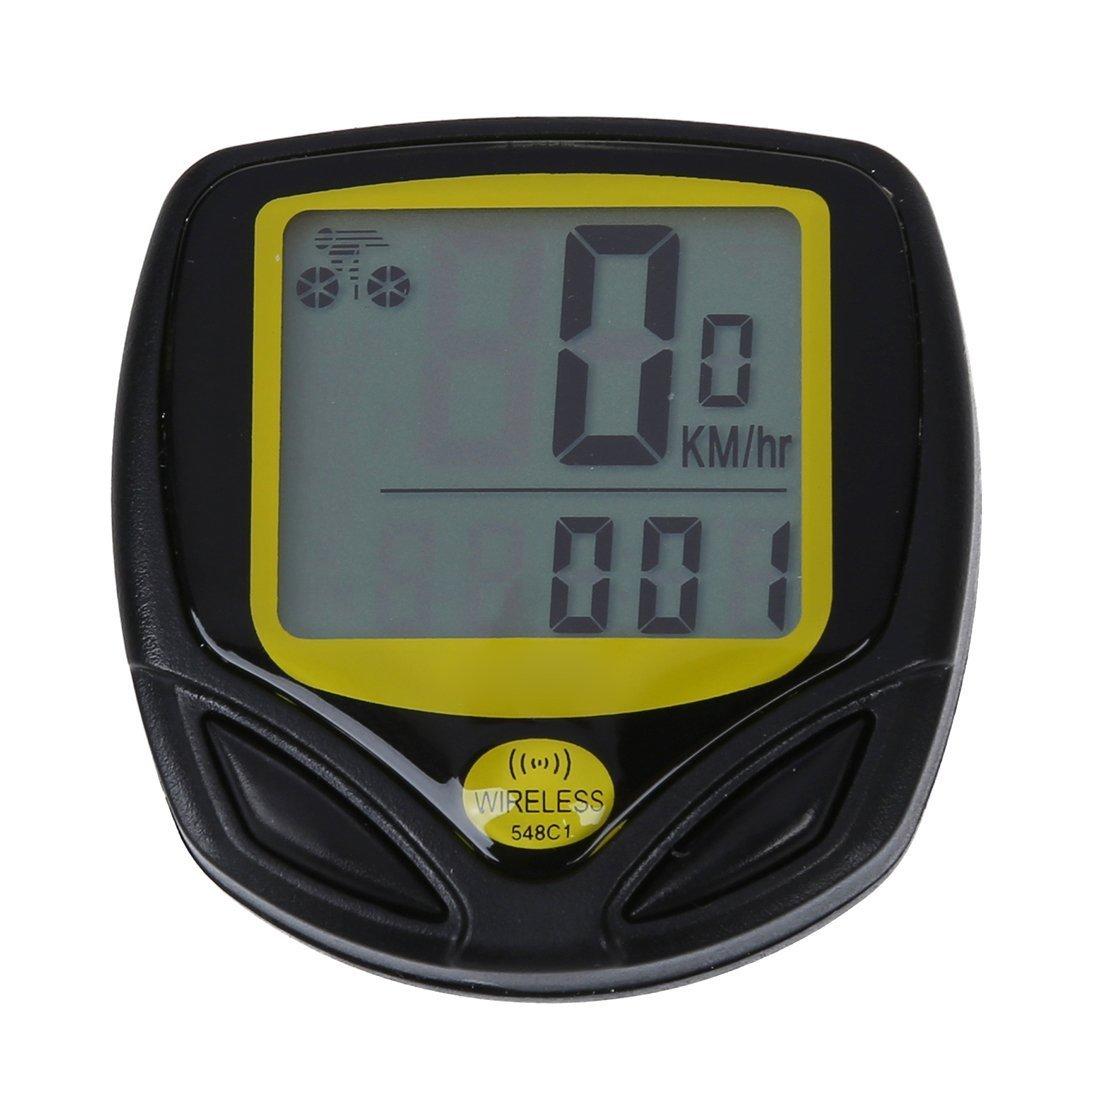 SODIAL(R) Inalambrico Bicicletas Cuentakilometros Velocimetro LED Impermeable Multifuncion